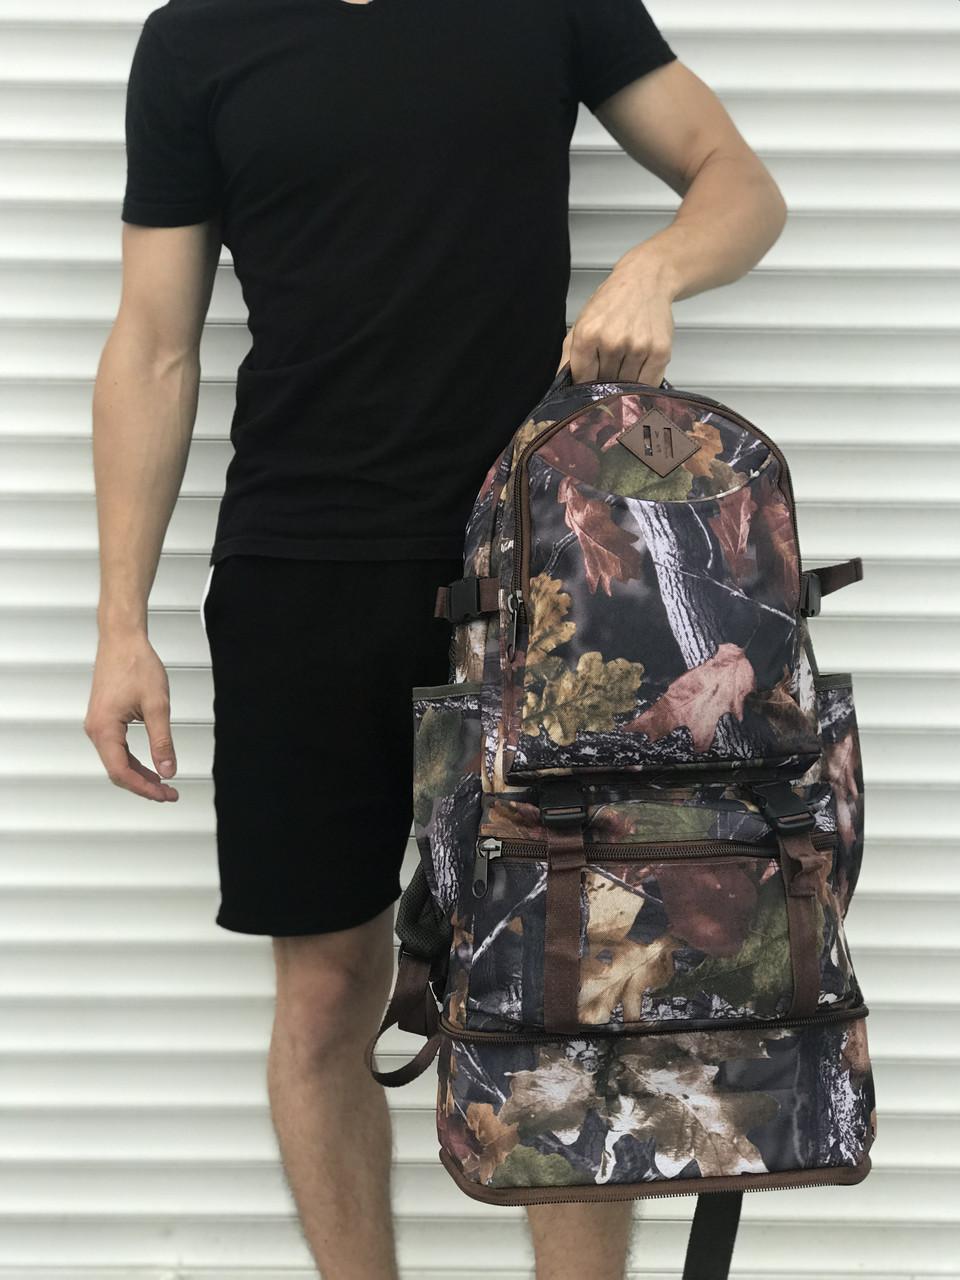 Рюкзак камуфляжний з розсувним дном, 40л + 5л